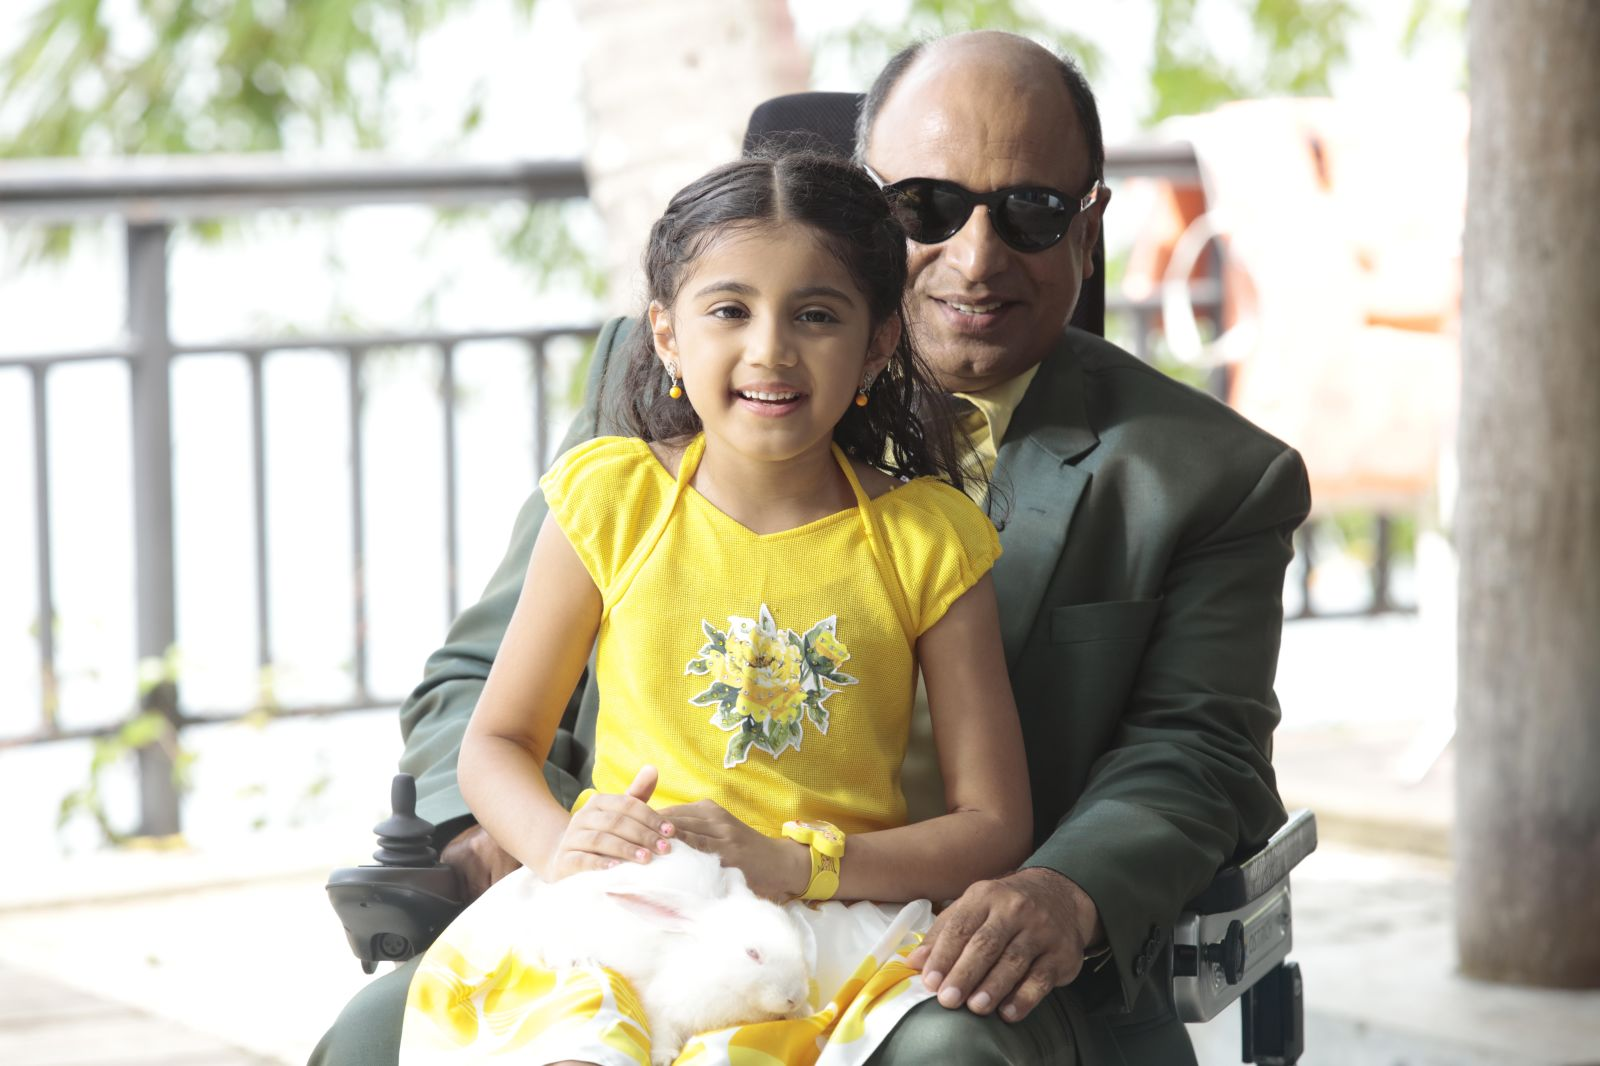 Bhaskar Oru Rascal Movie Stills Tamilnext